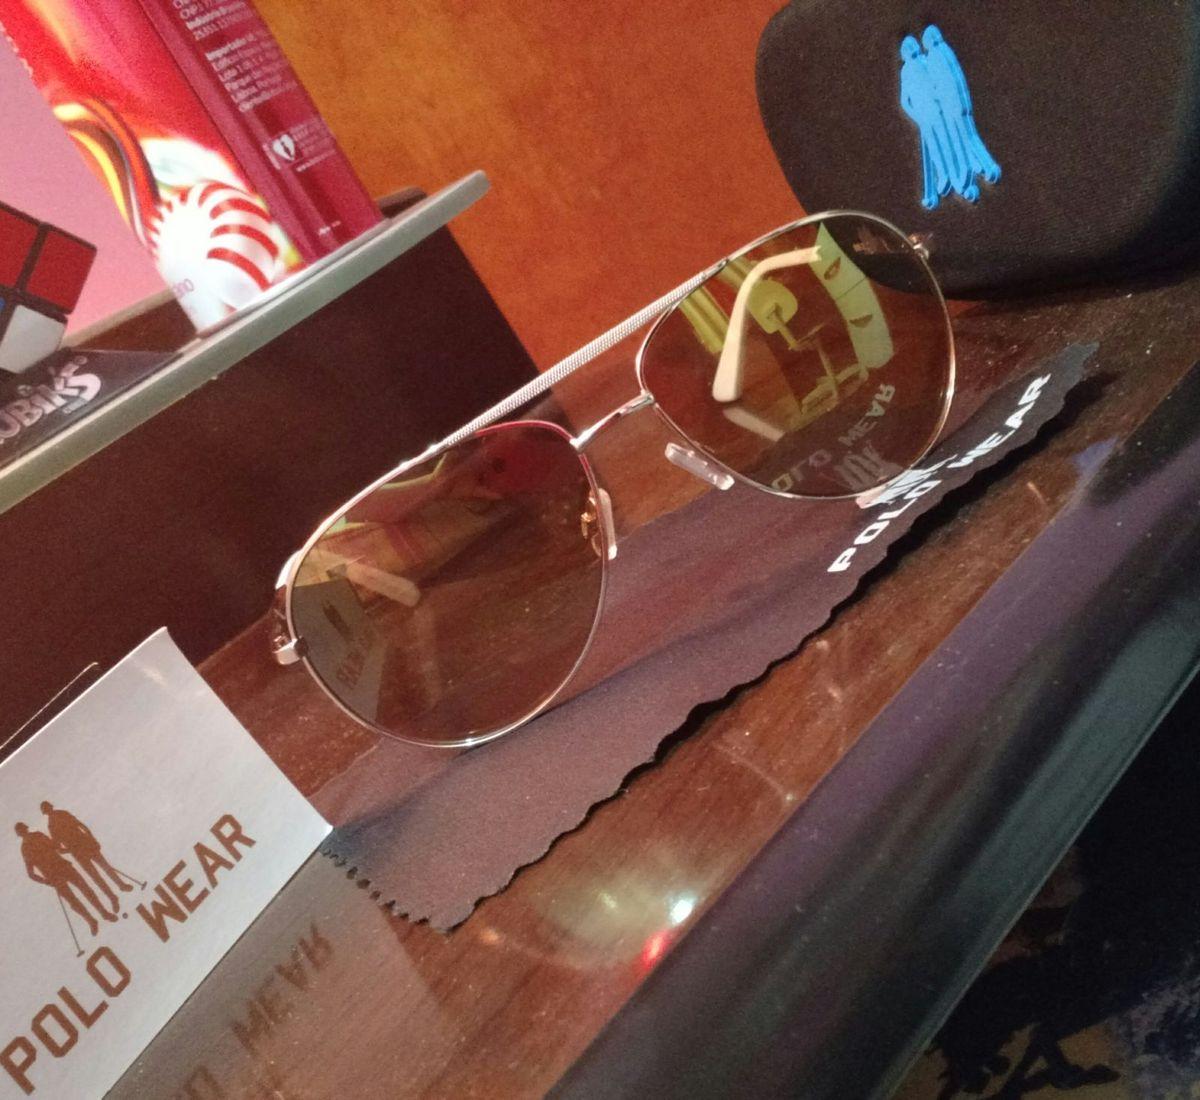 oculos de sol aviador marrom - óculos polo wear.  Czm6ly9wag90b3muzw5qb2vplmnvbs5ici9wcm9kdwn0cy80otm4nta1lzy1zjgyymrmmgjhmza4mzi1yjq3othlyju2mgq3mtqxlmpwzw  ... 0722833550